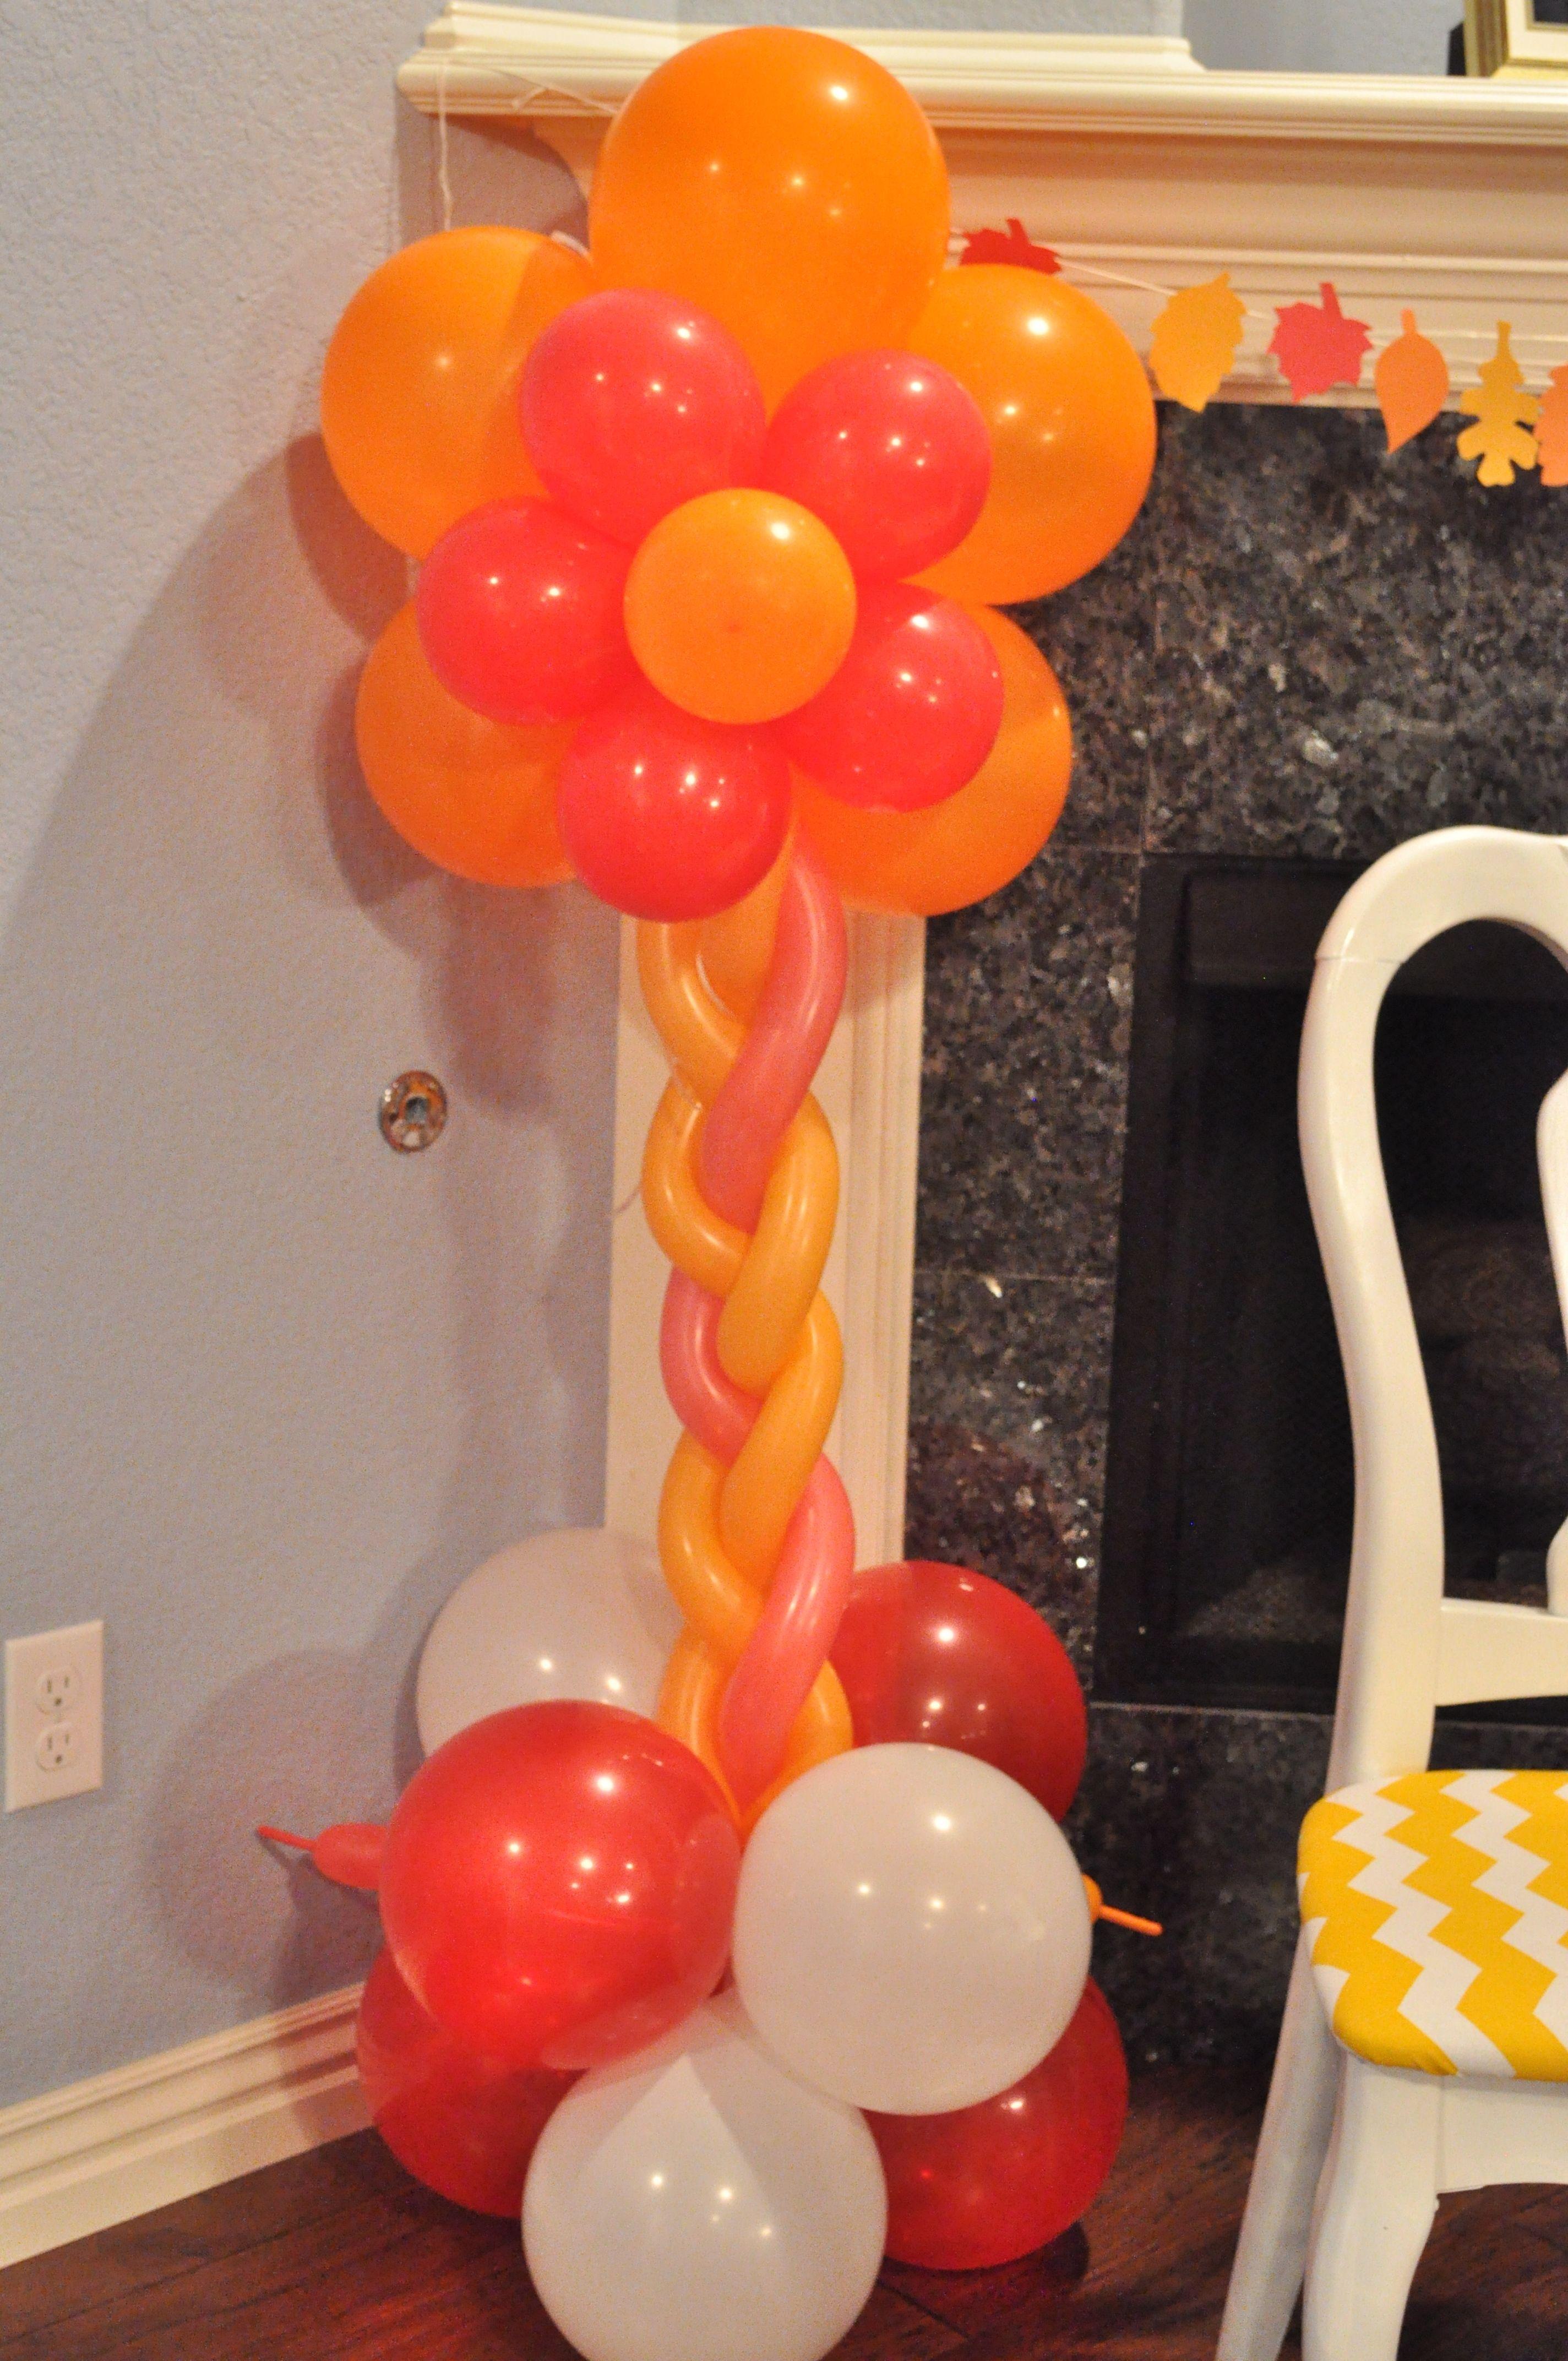 Wedding decoration ideas balloons  Fall Theme  Balloons  DIY Wedding Decorations  Pinterest  More